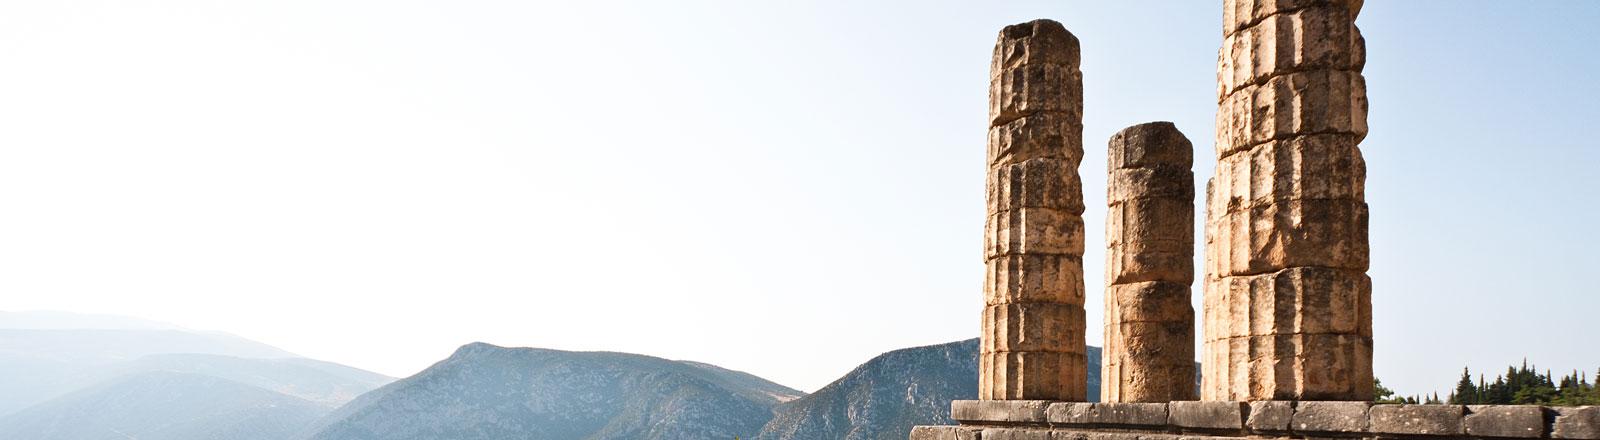 Tempel des Apollo